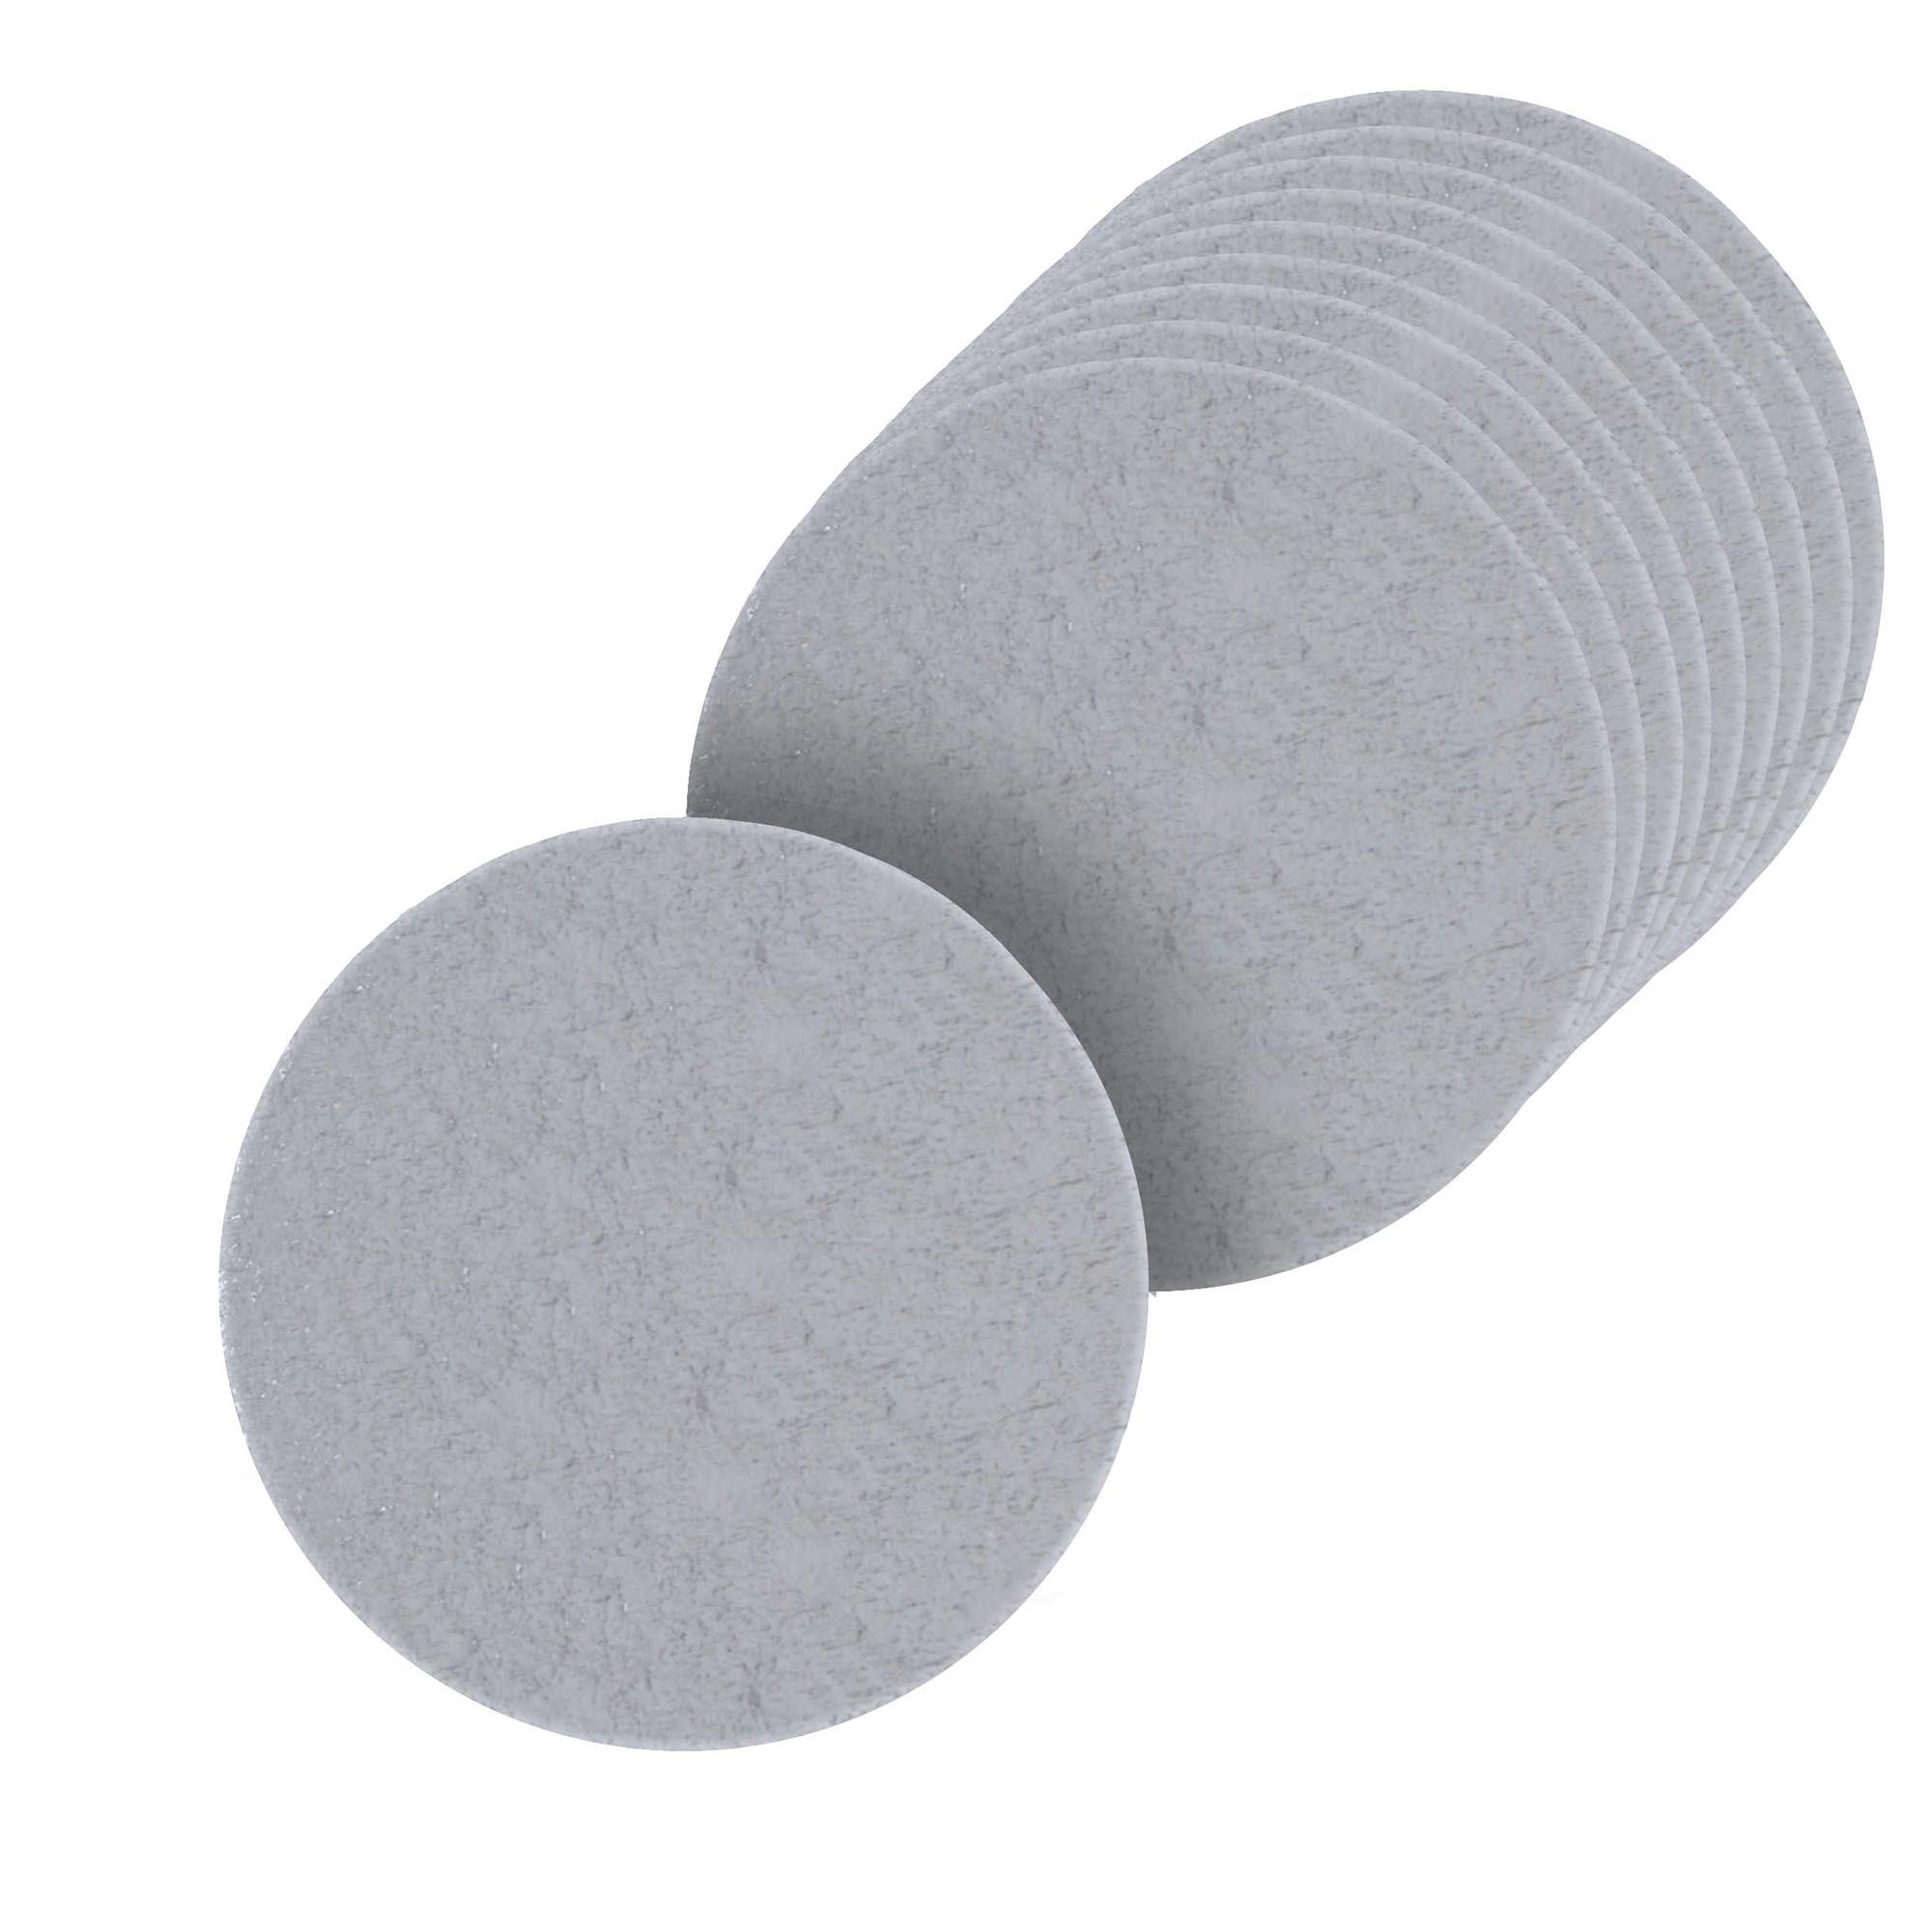 100 Bases Laminadas, Suporte P/ Doces, Disco 6cm - Prata